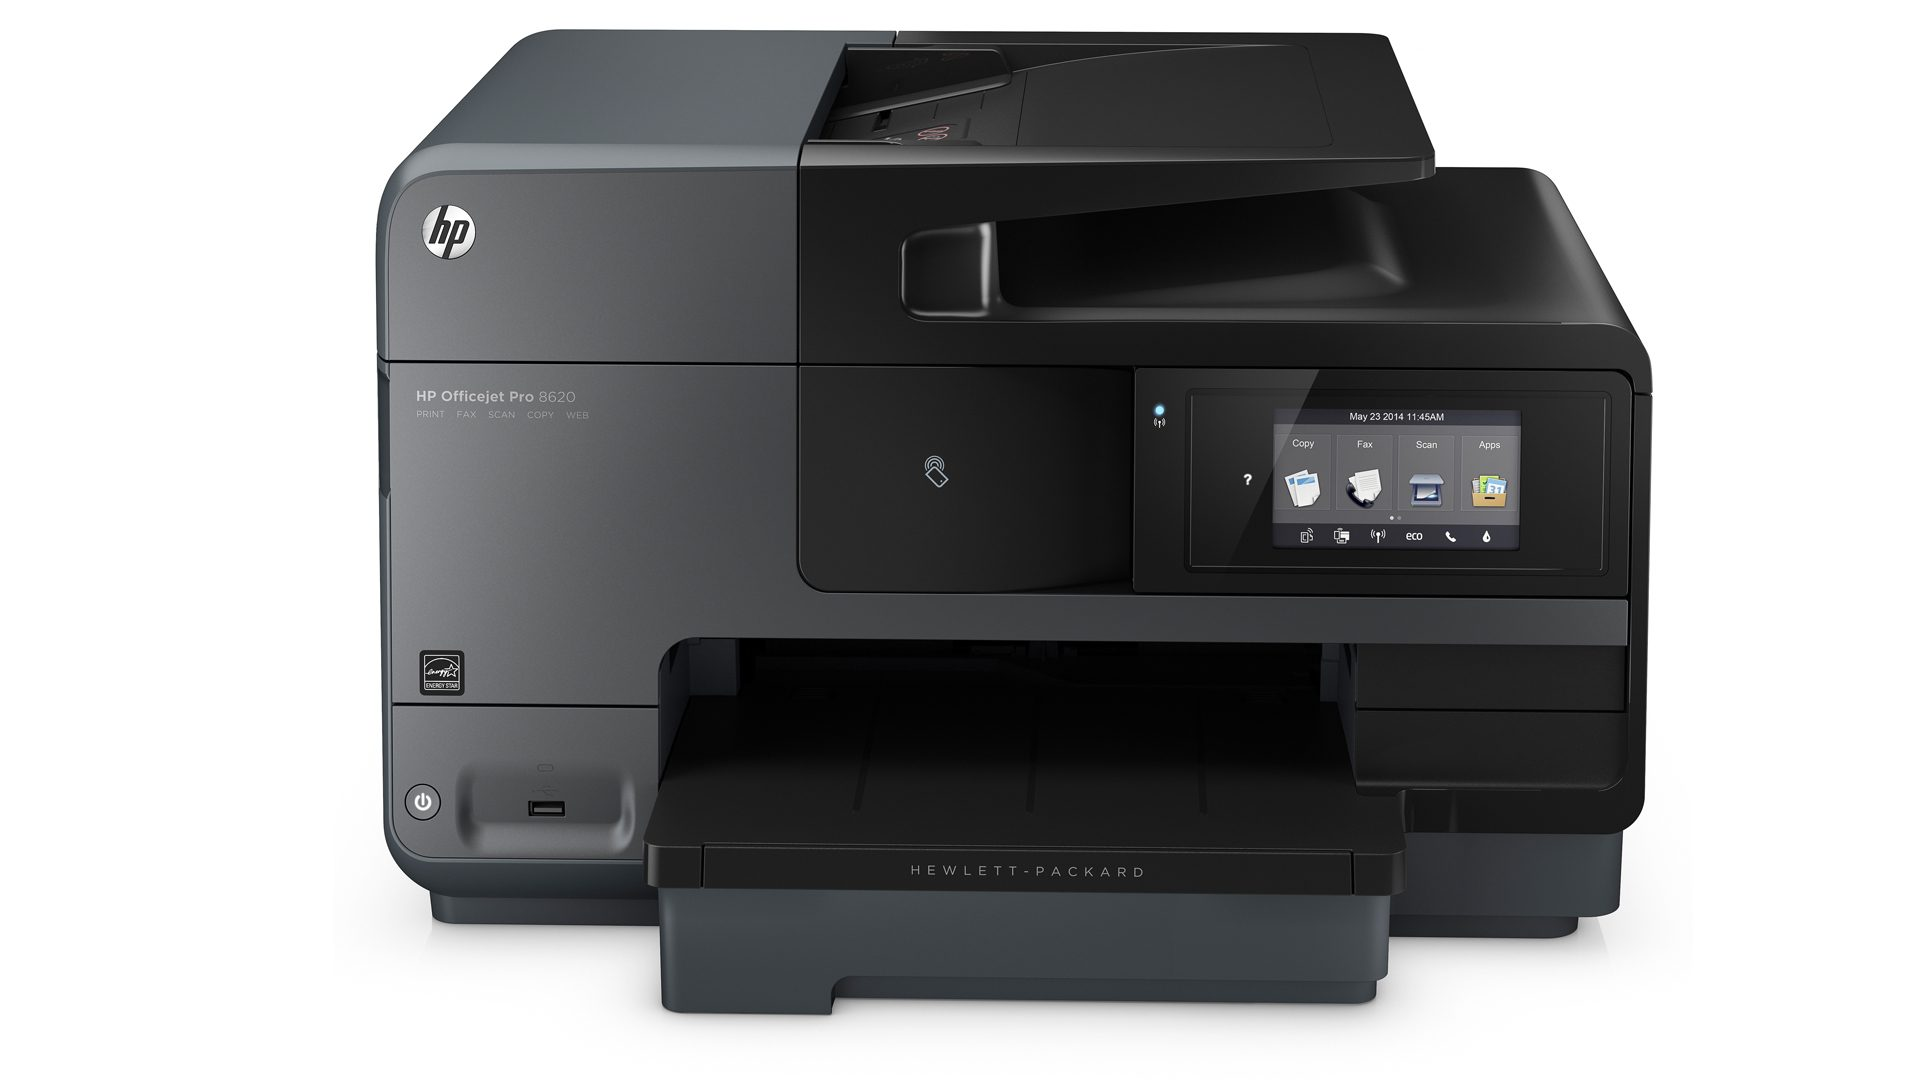 HP-Officejet-Pro-8620—Anischten-1